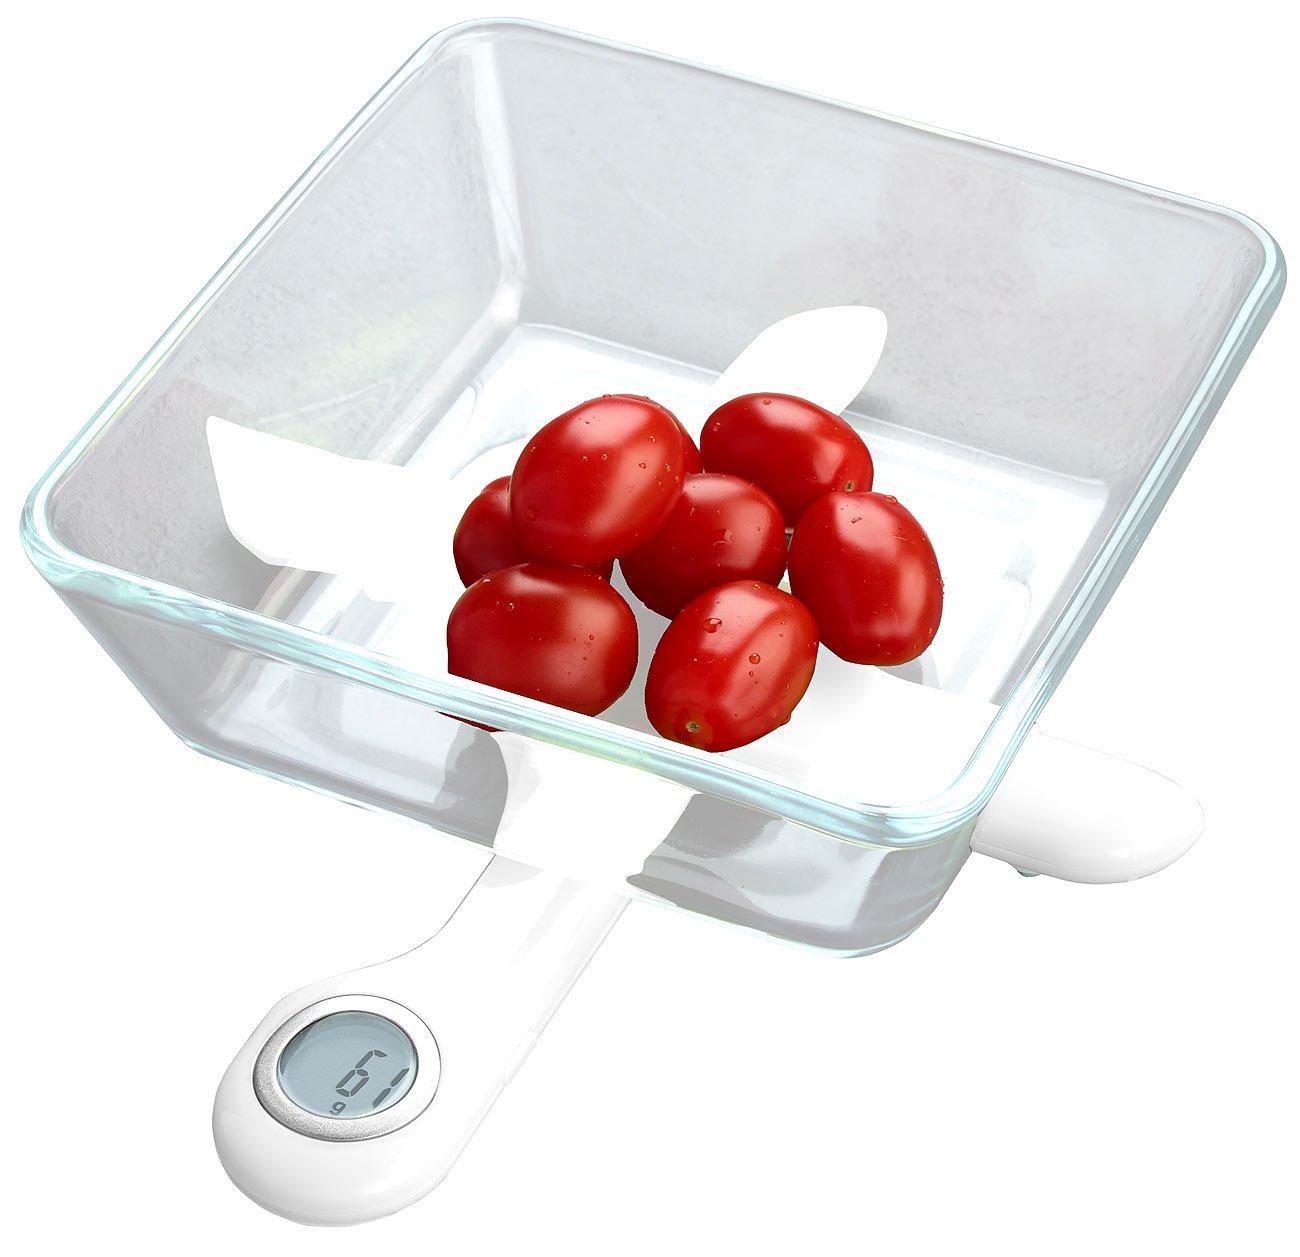 Rosenstein & Söhne - Báscula portátil: compacto digital Báscula de cocina en diseño plegable, hasta 5 kg, función de tara (Báscula de cocina plegable): ...